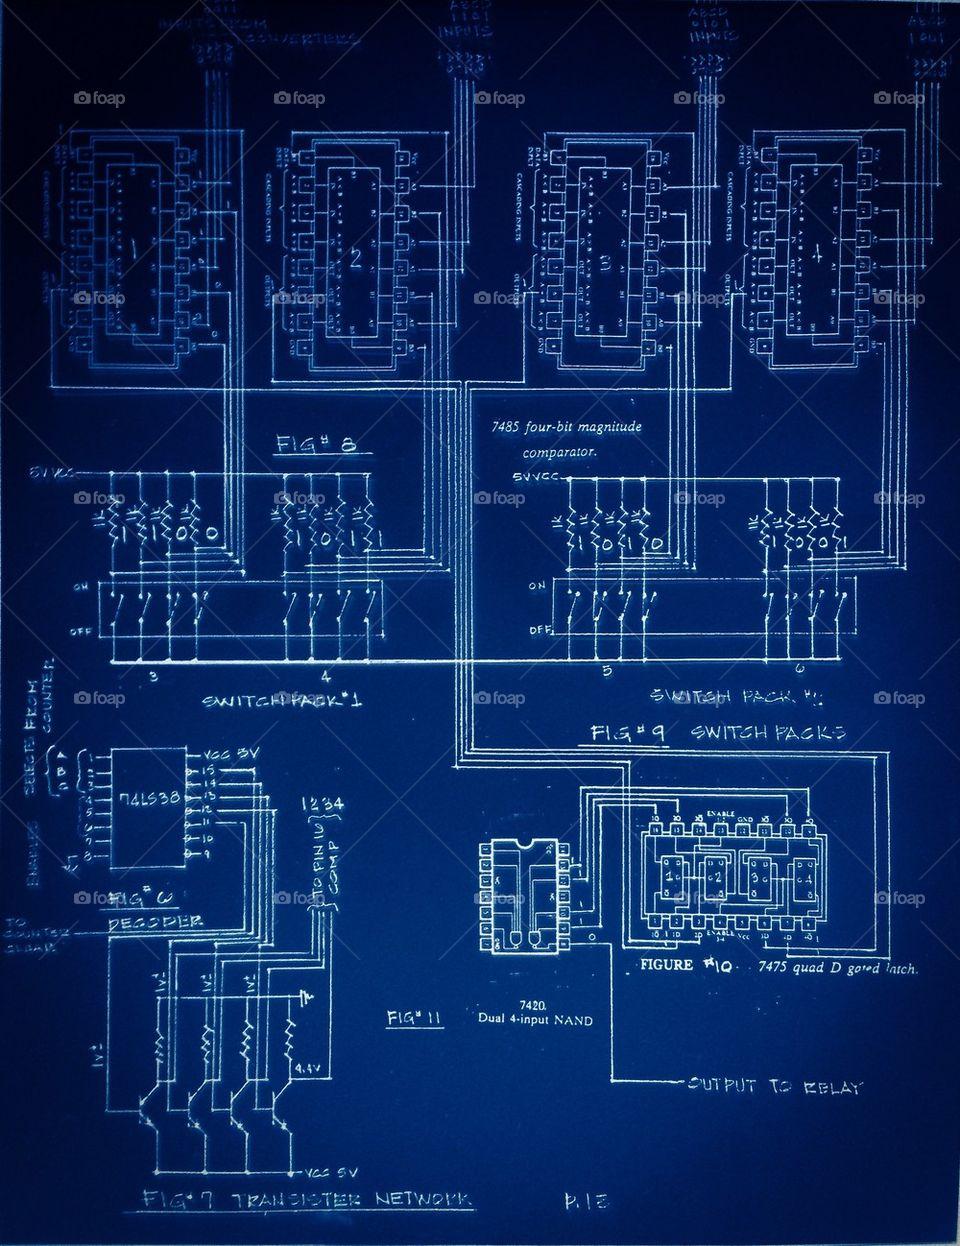 Foap.com: Circuit board blueprint stock photo by mikehutch40